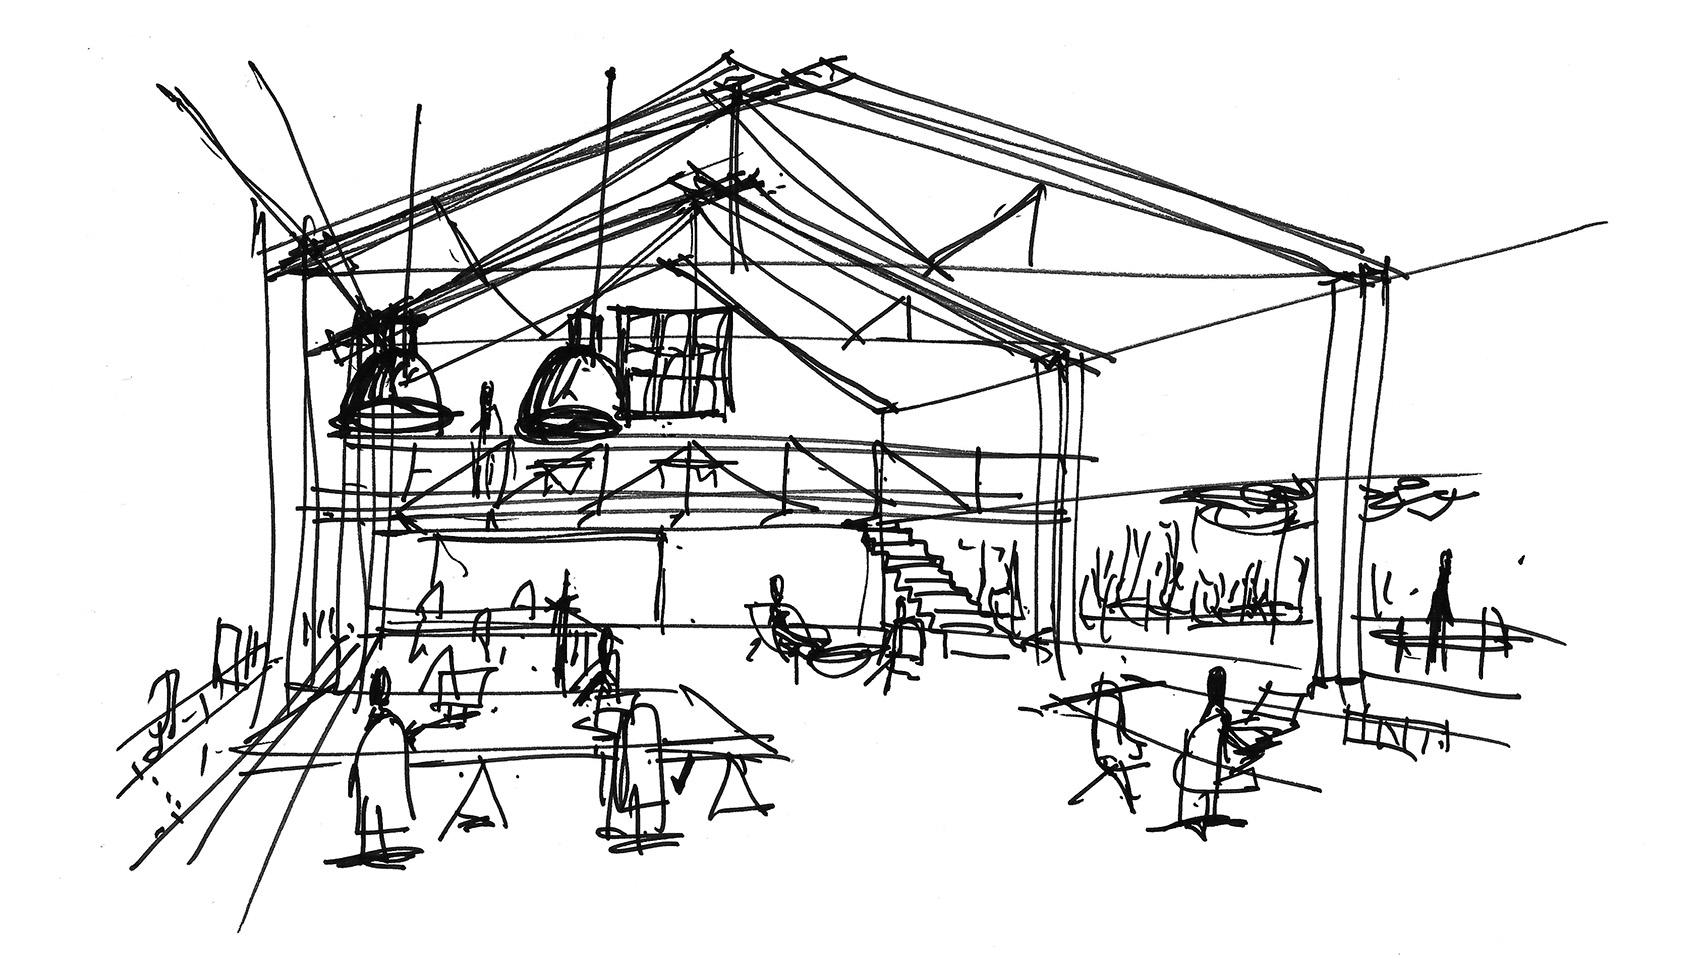 arquitectura-y-coworking-1.-wayco-ruzafa